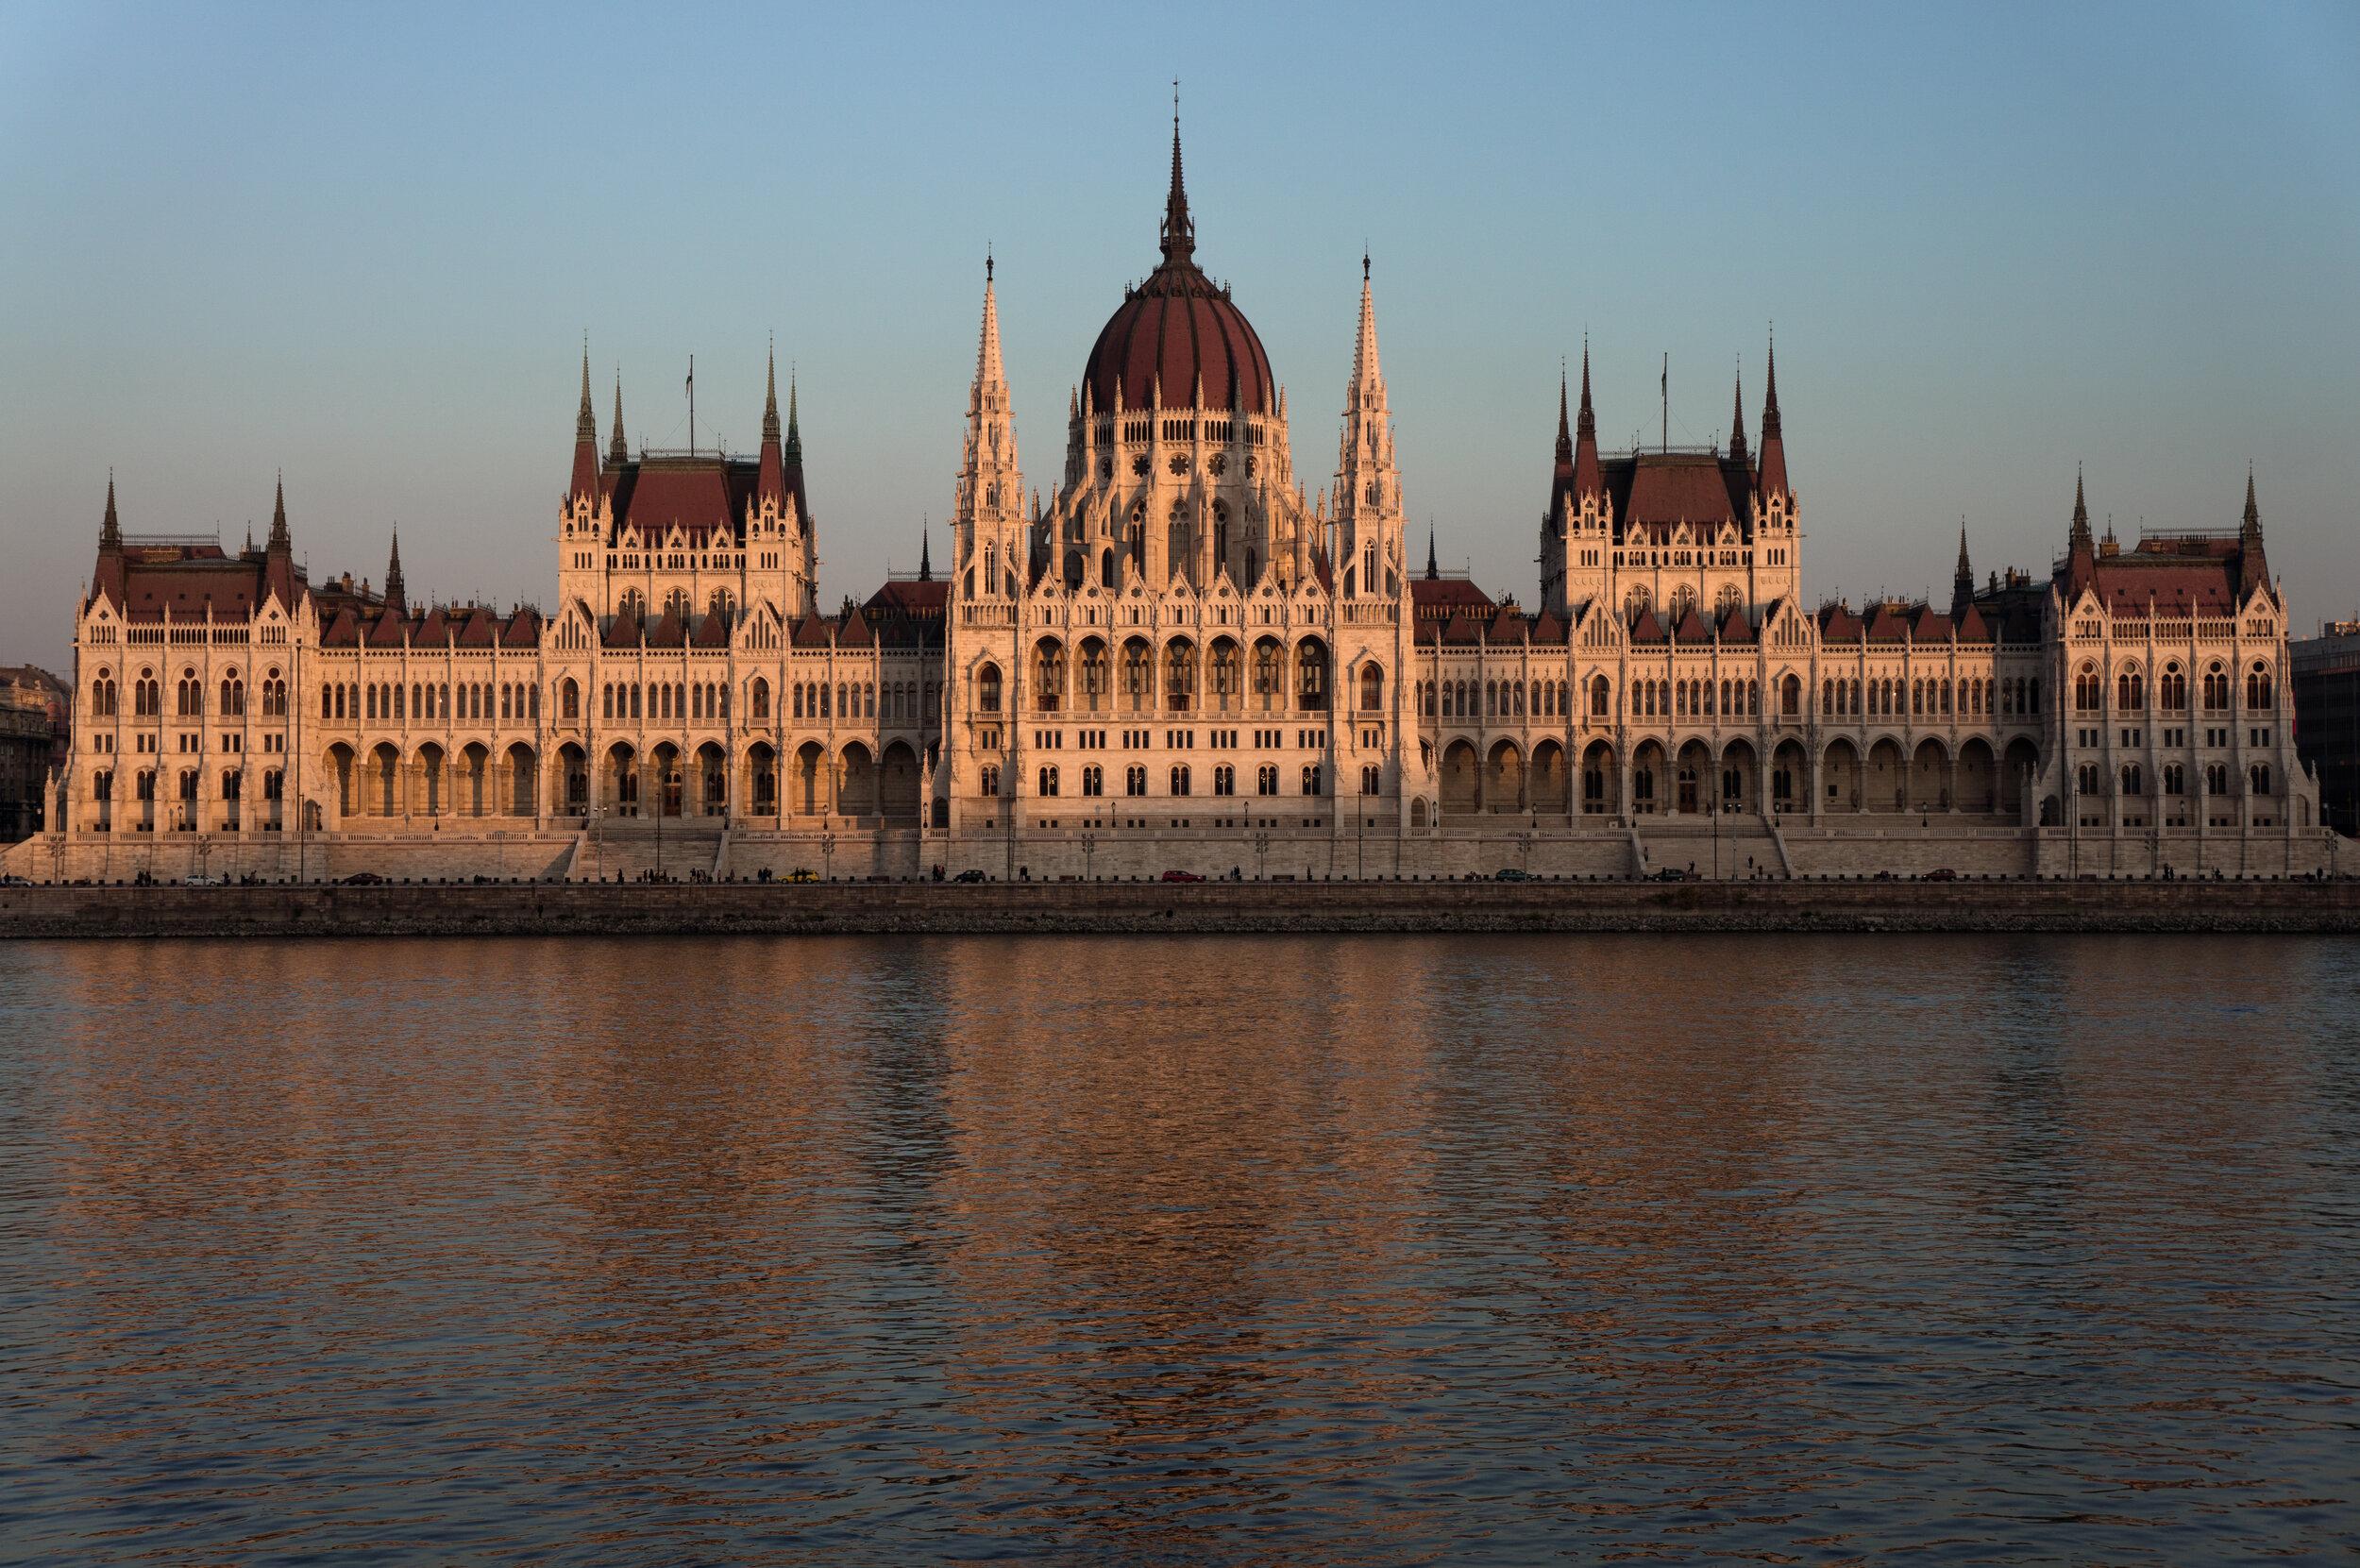 Parliament at Dusk